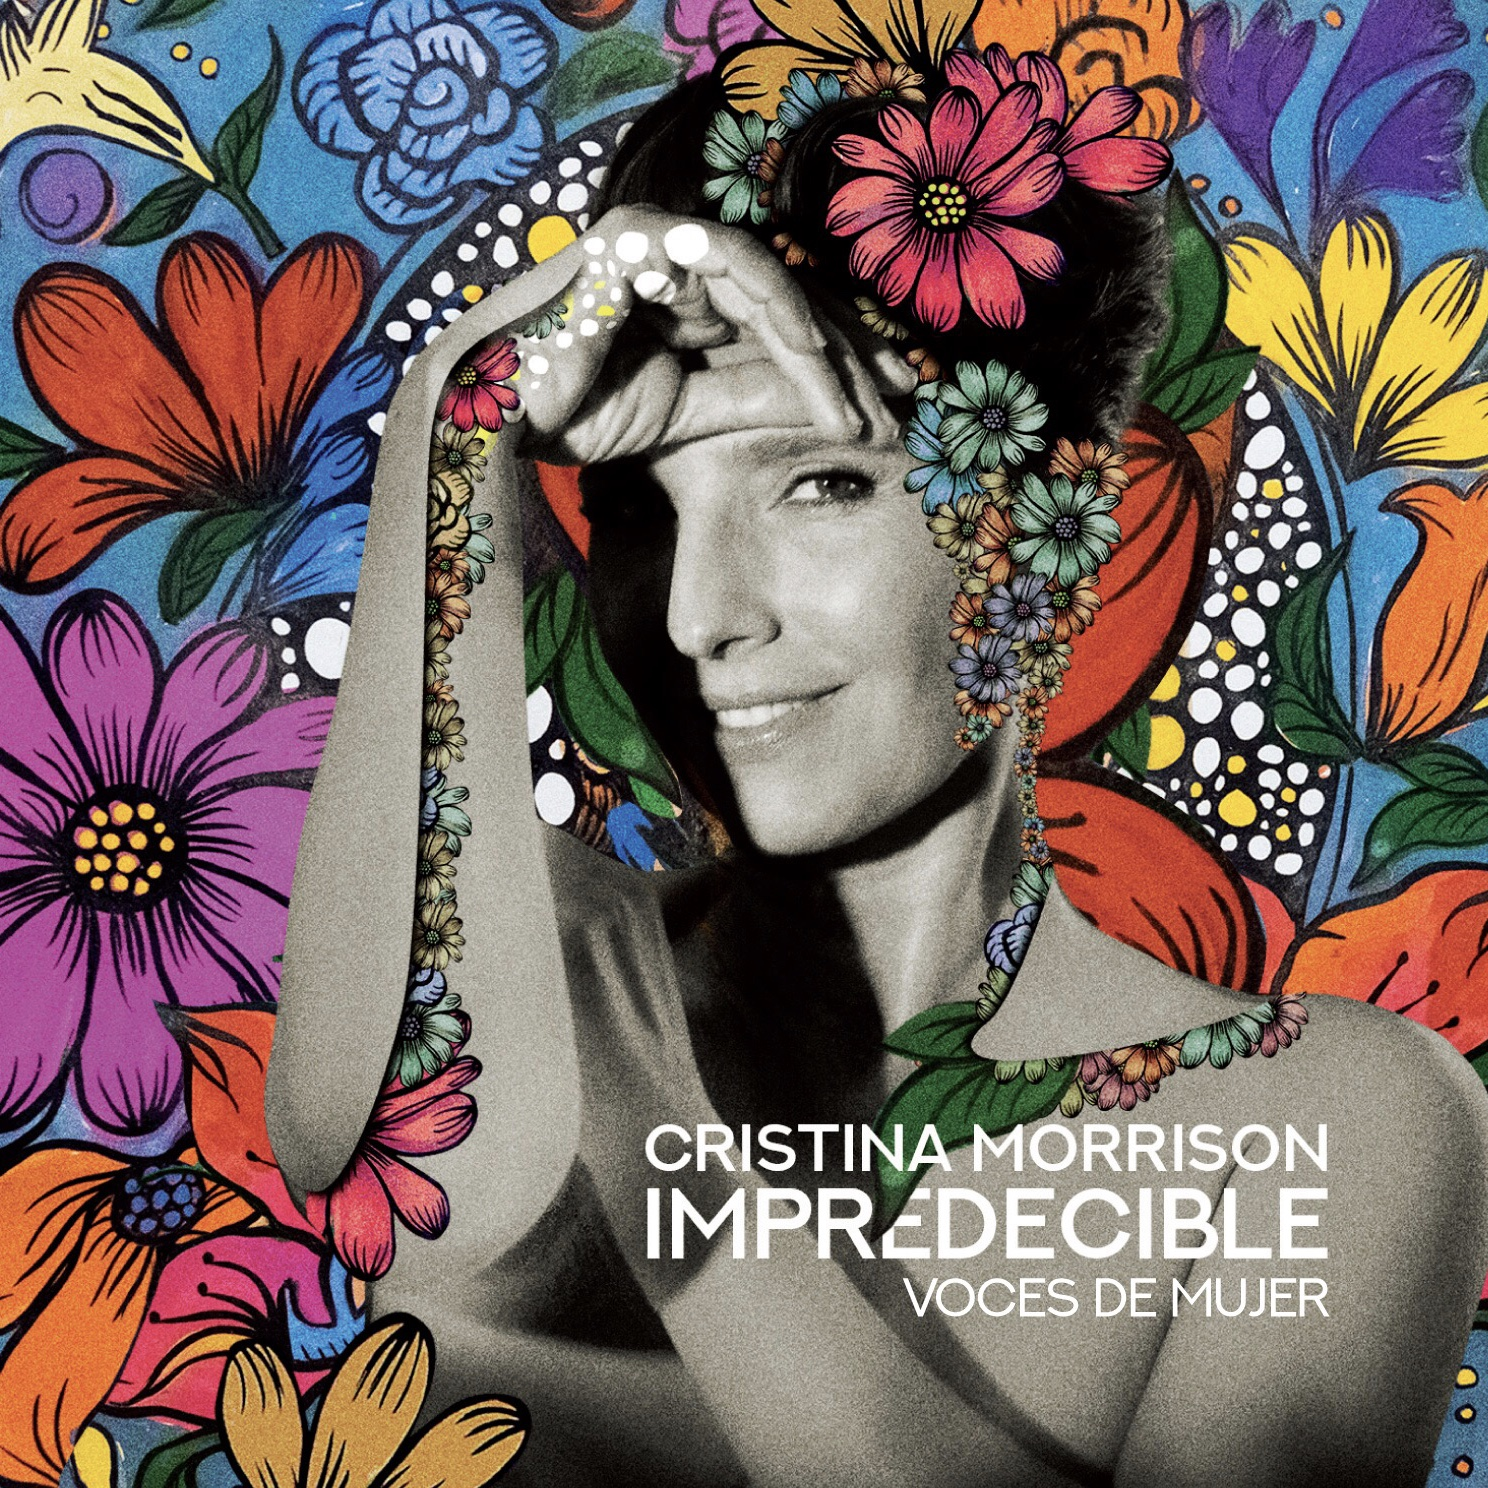 Cristina Morrison - IMPREDECIBLE